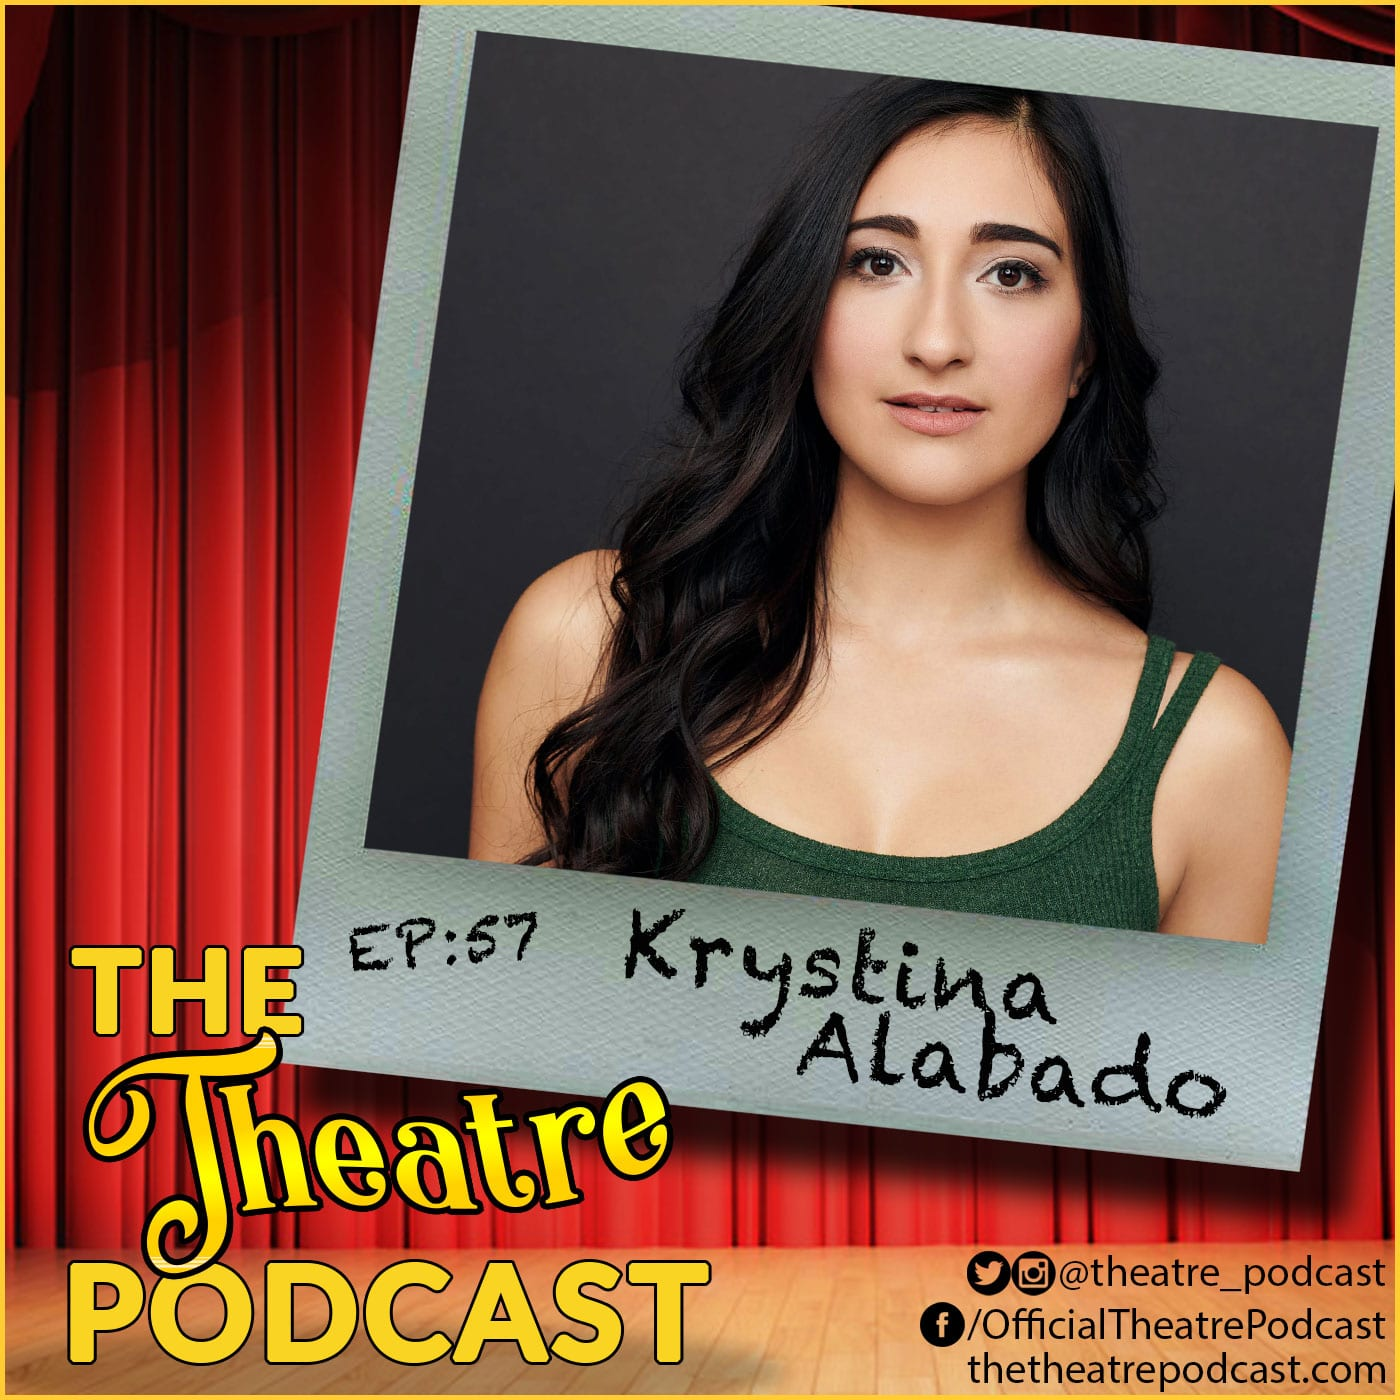 Episode 57 The Theatre Podcast Guest Krystina-Alabado